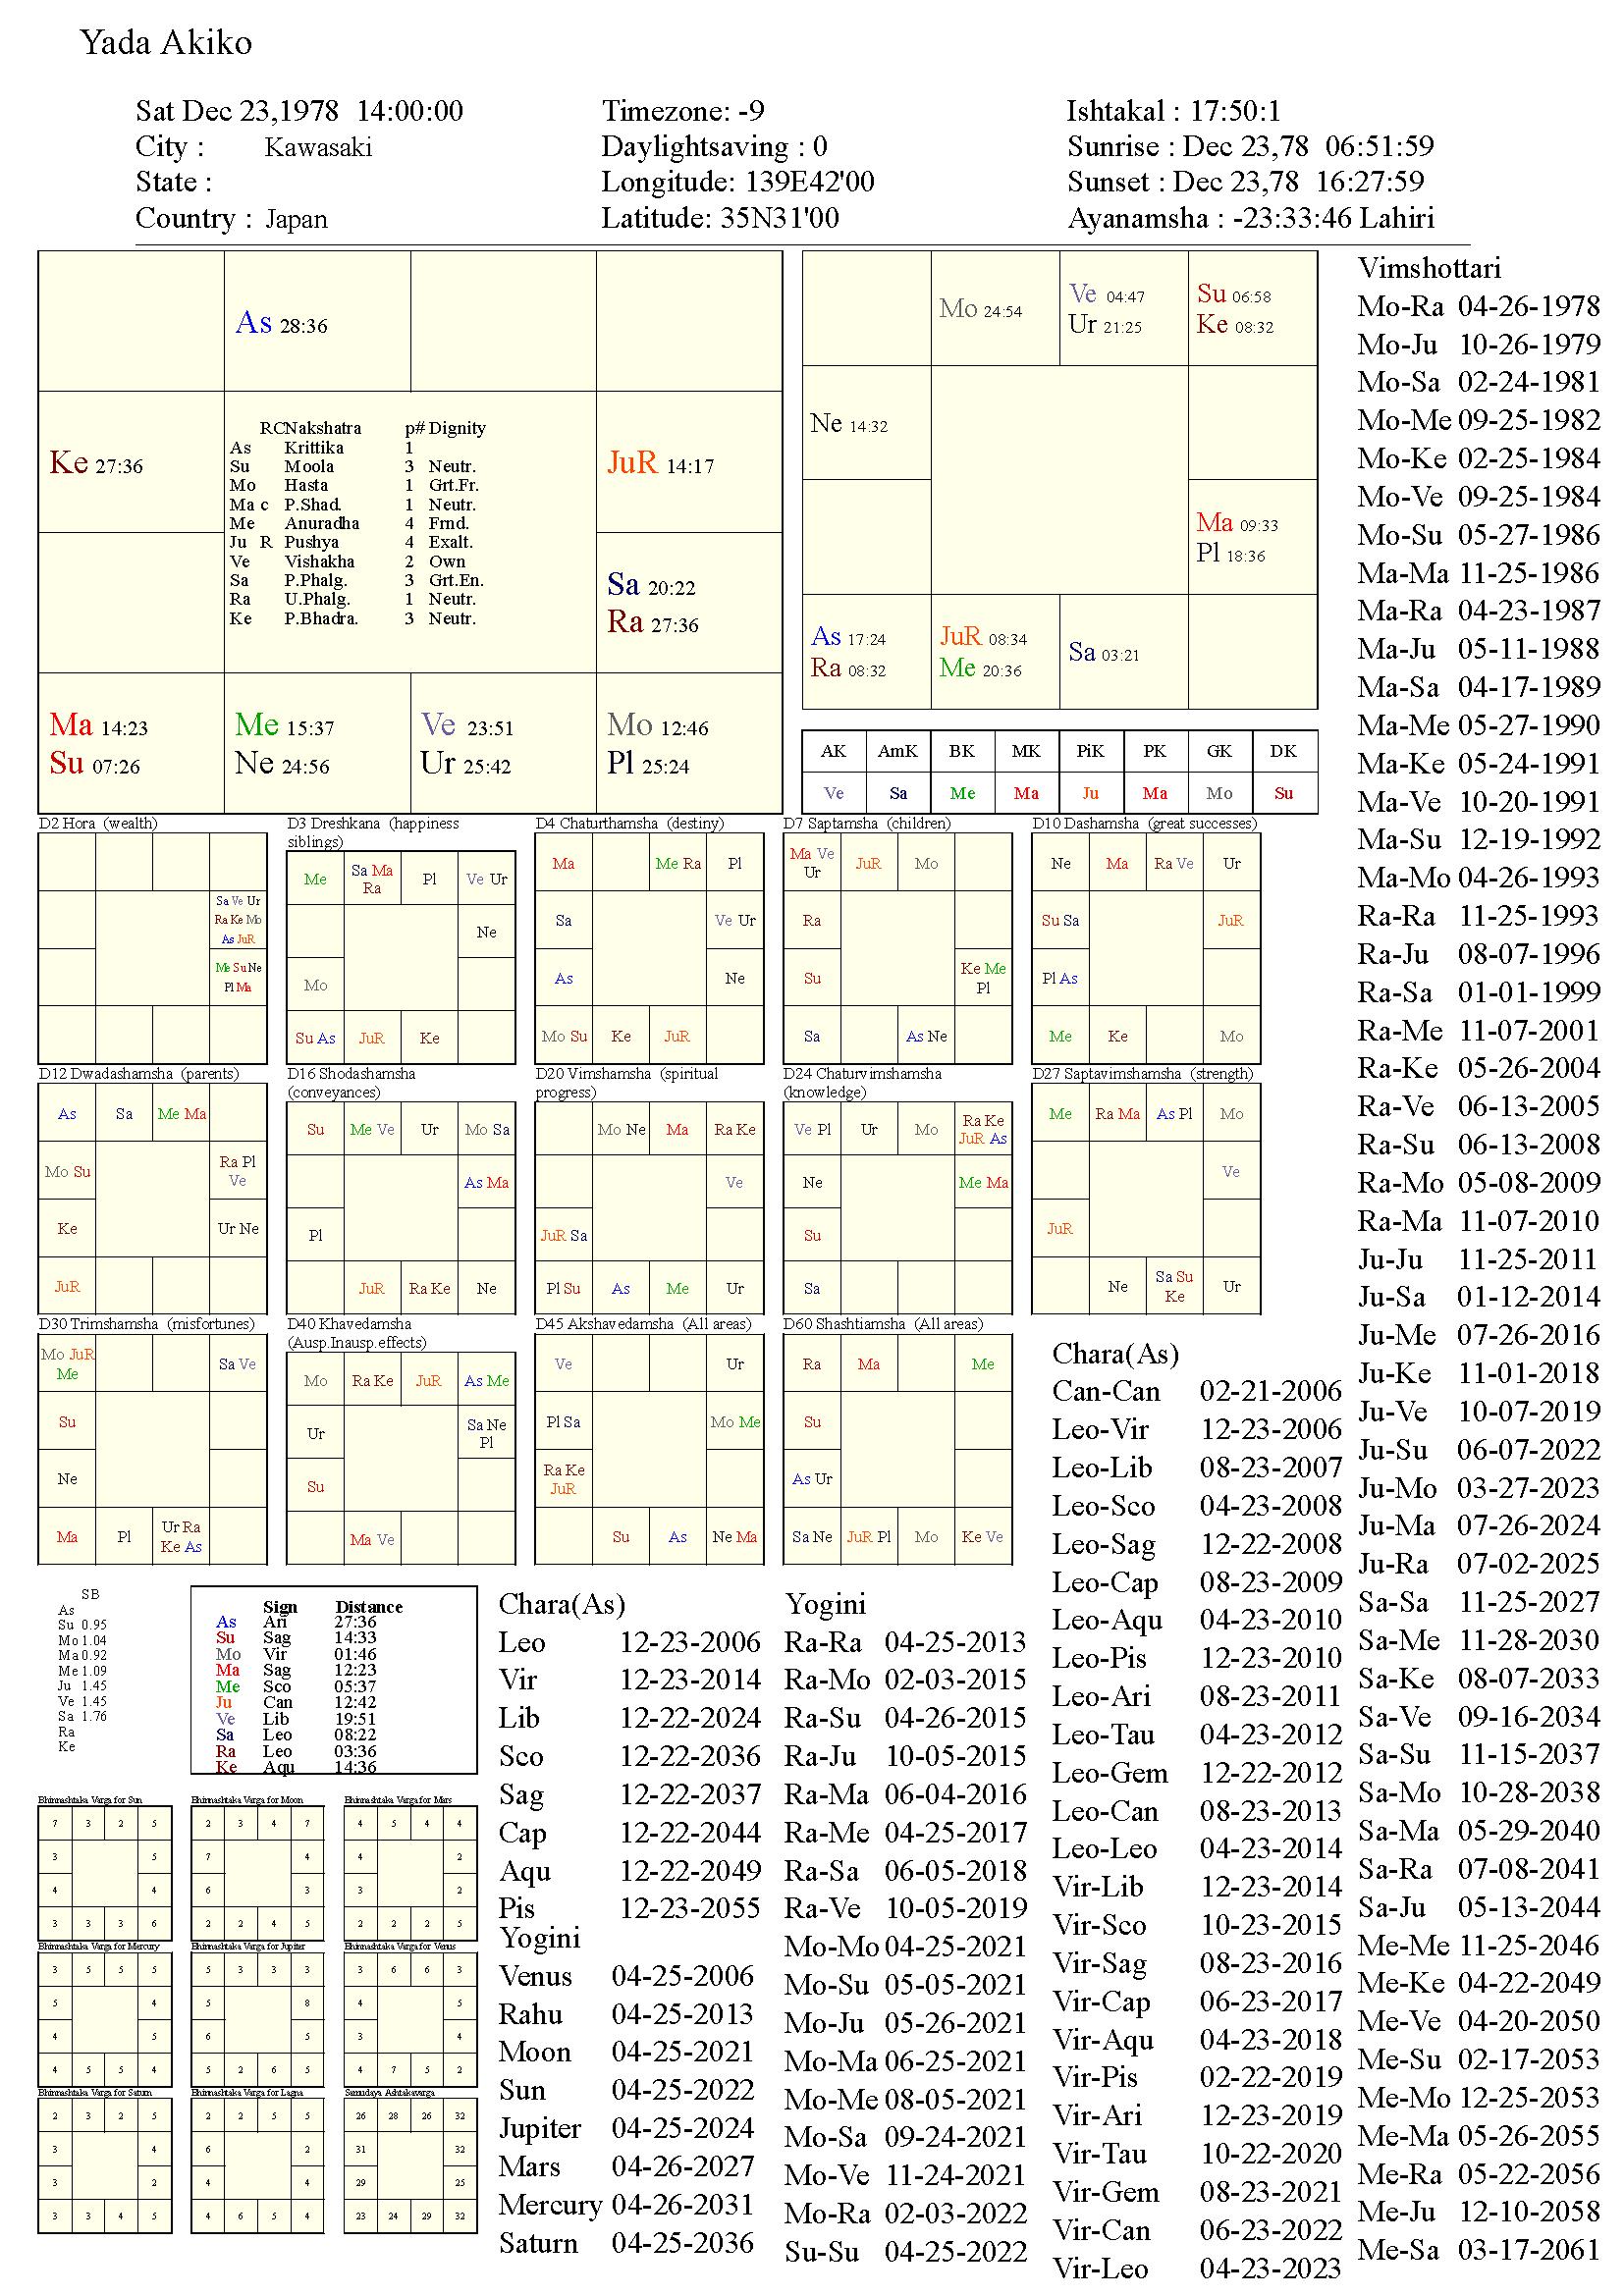 yadaakiko_chart